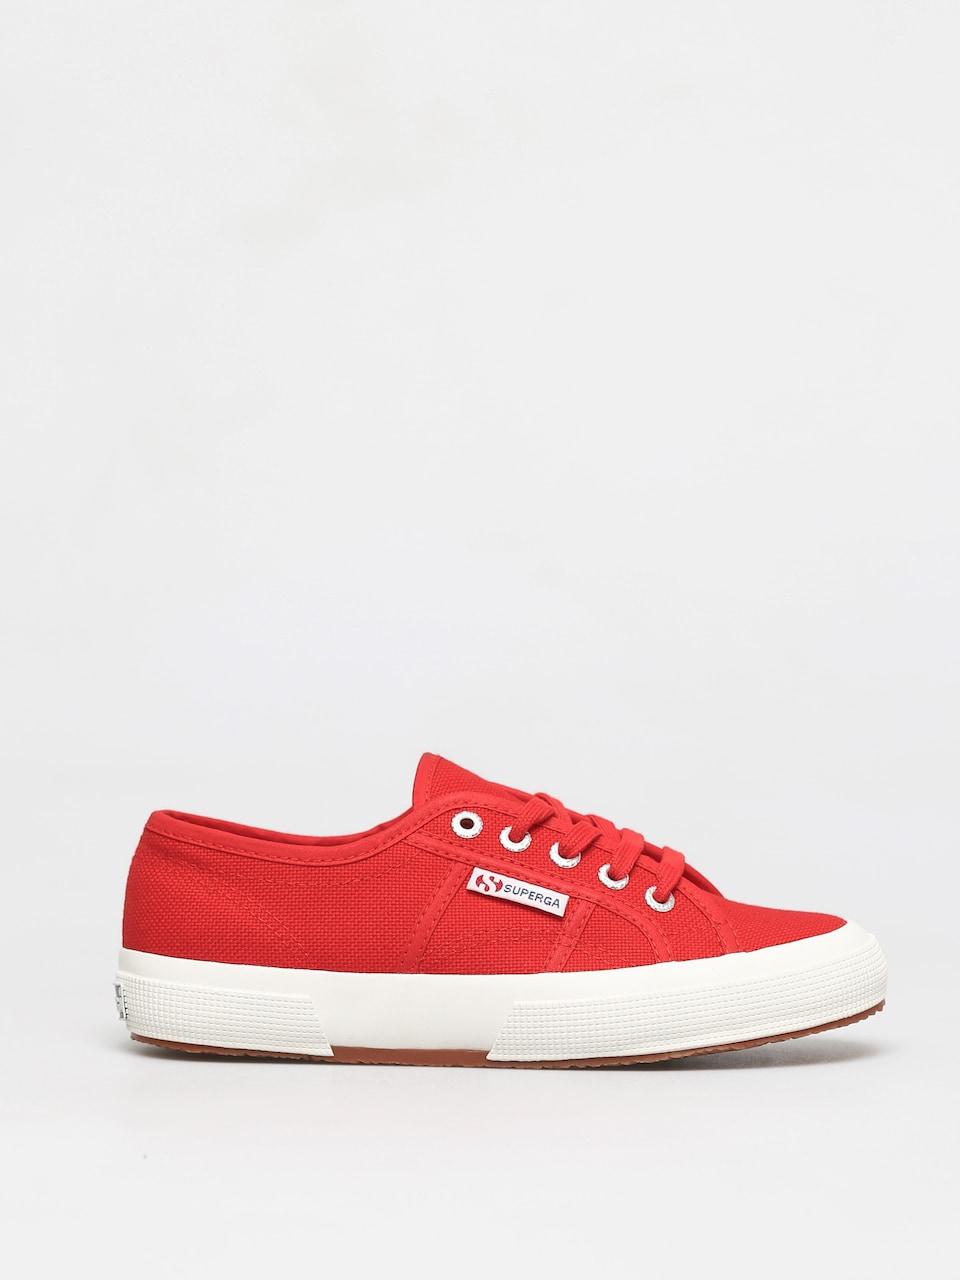 Superga 2750 Cotu Classic Shoes Wmn